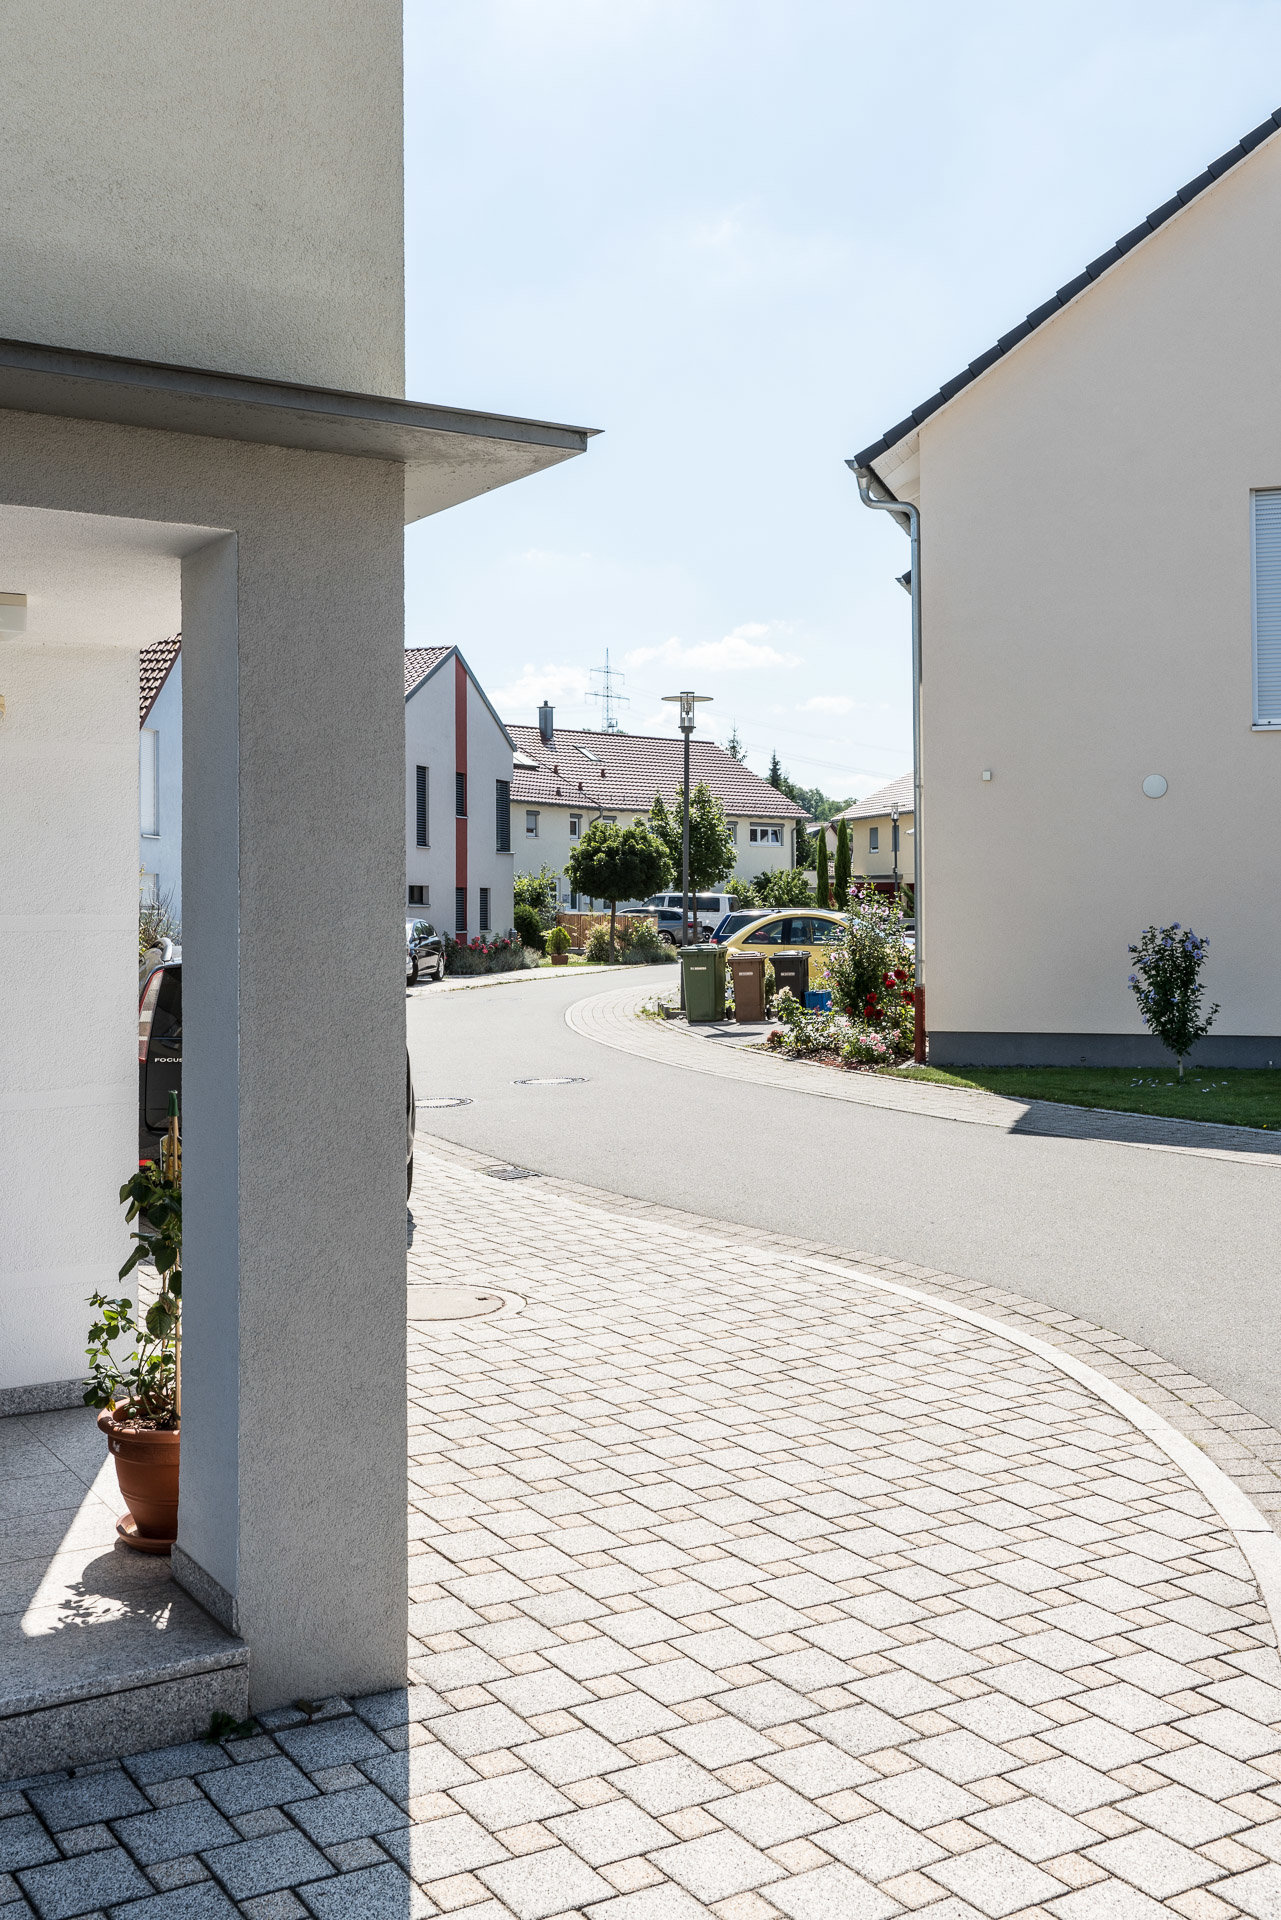 Rauenberg-Maerzwiesen-83.jpg